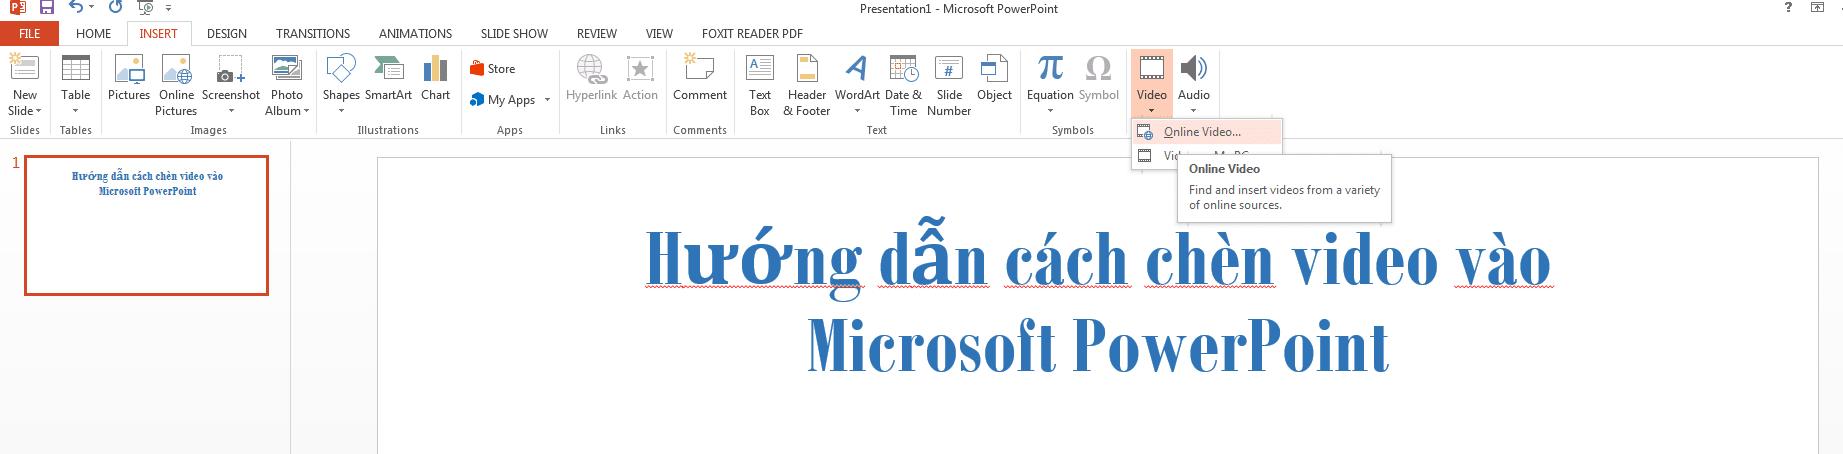 huong-dan-cach-chen-video-vao-slide-power-point